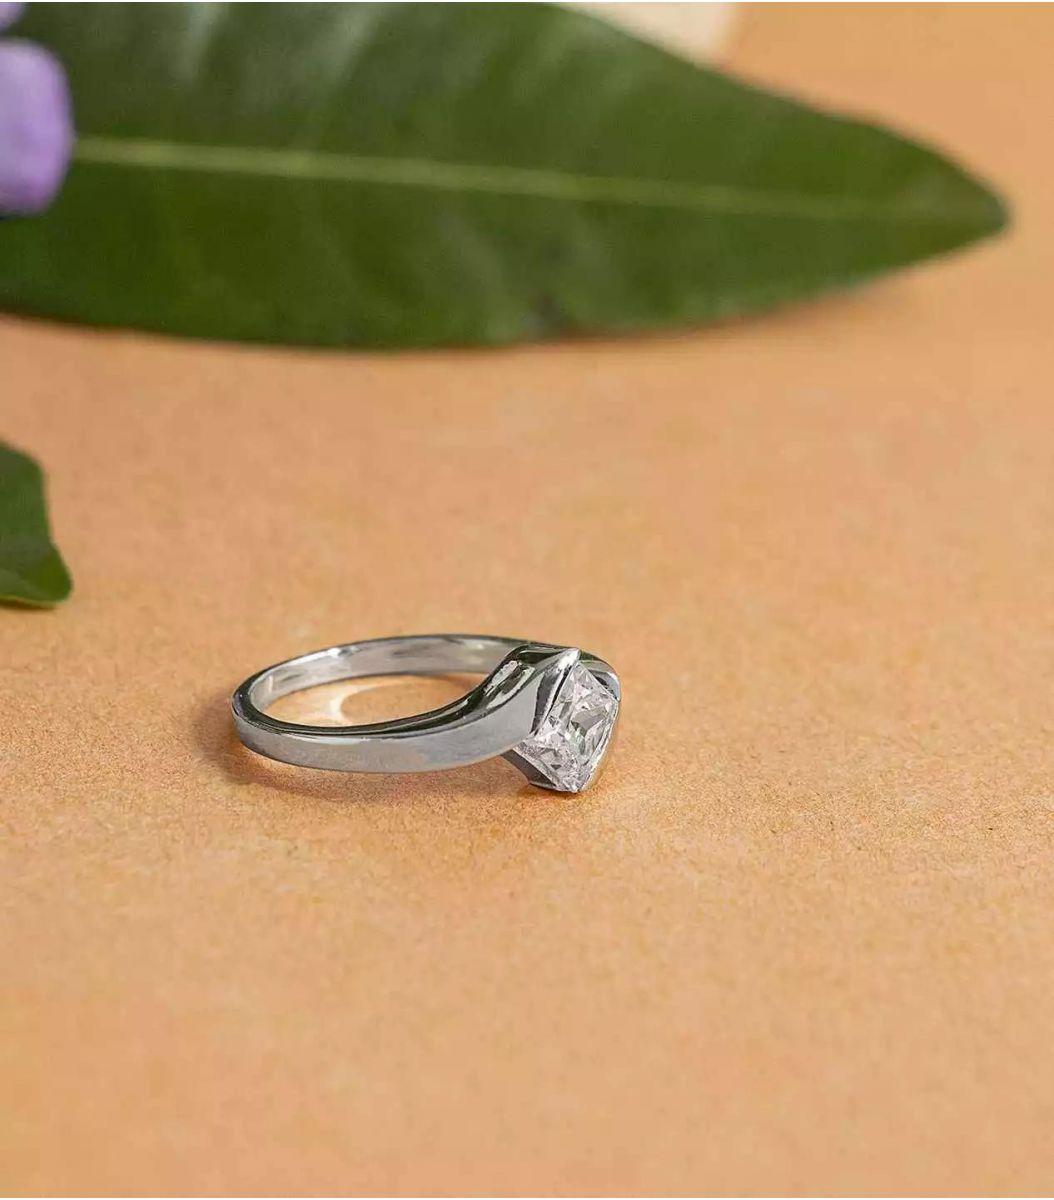 Silver Stone Finger Ring FJ1660208